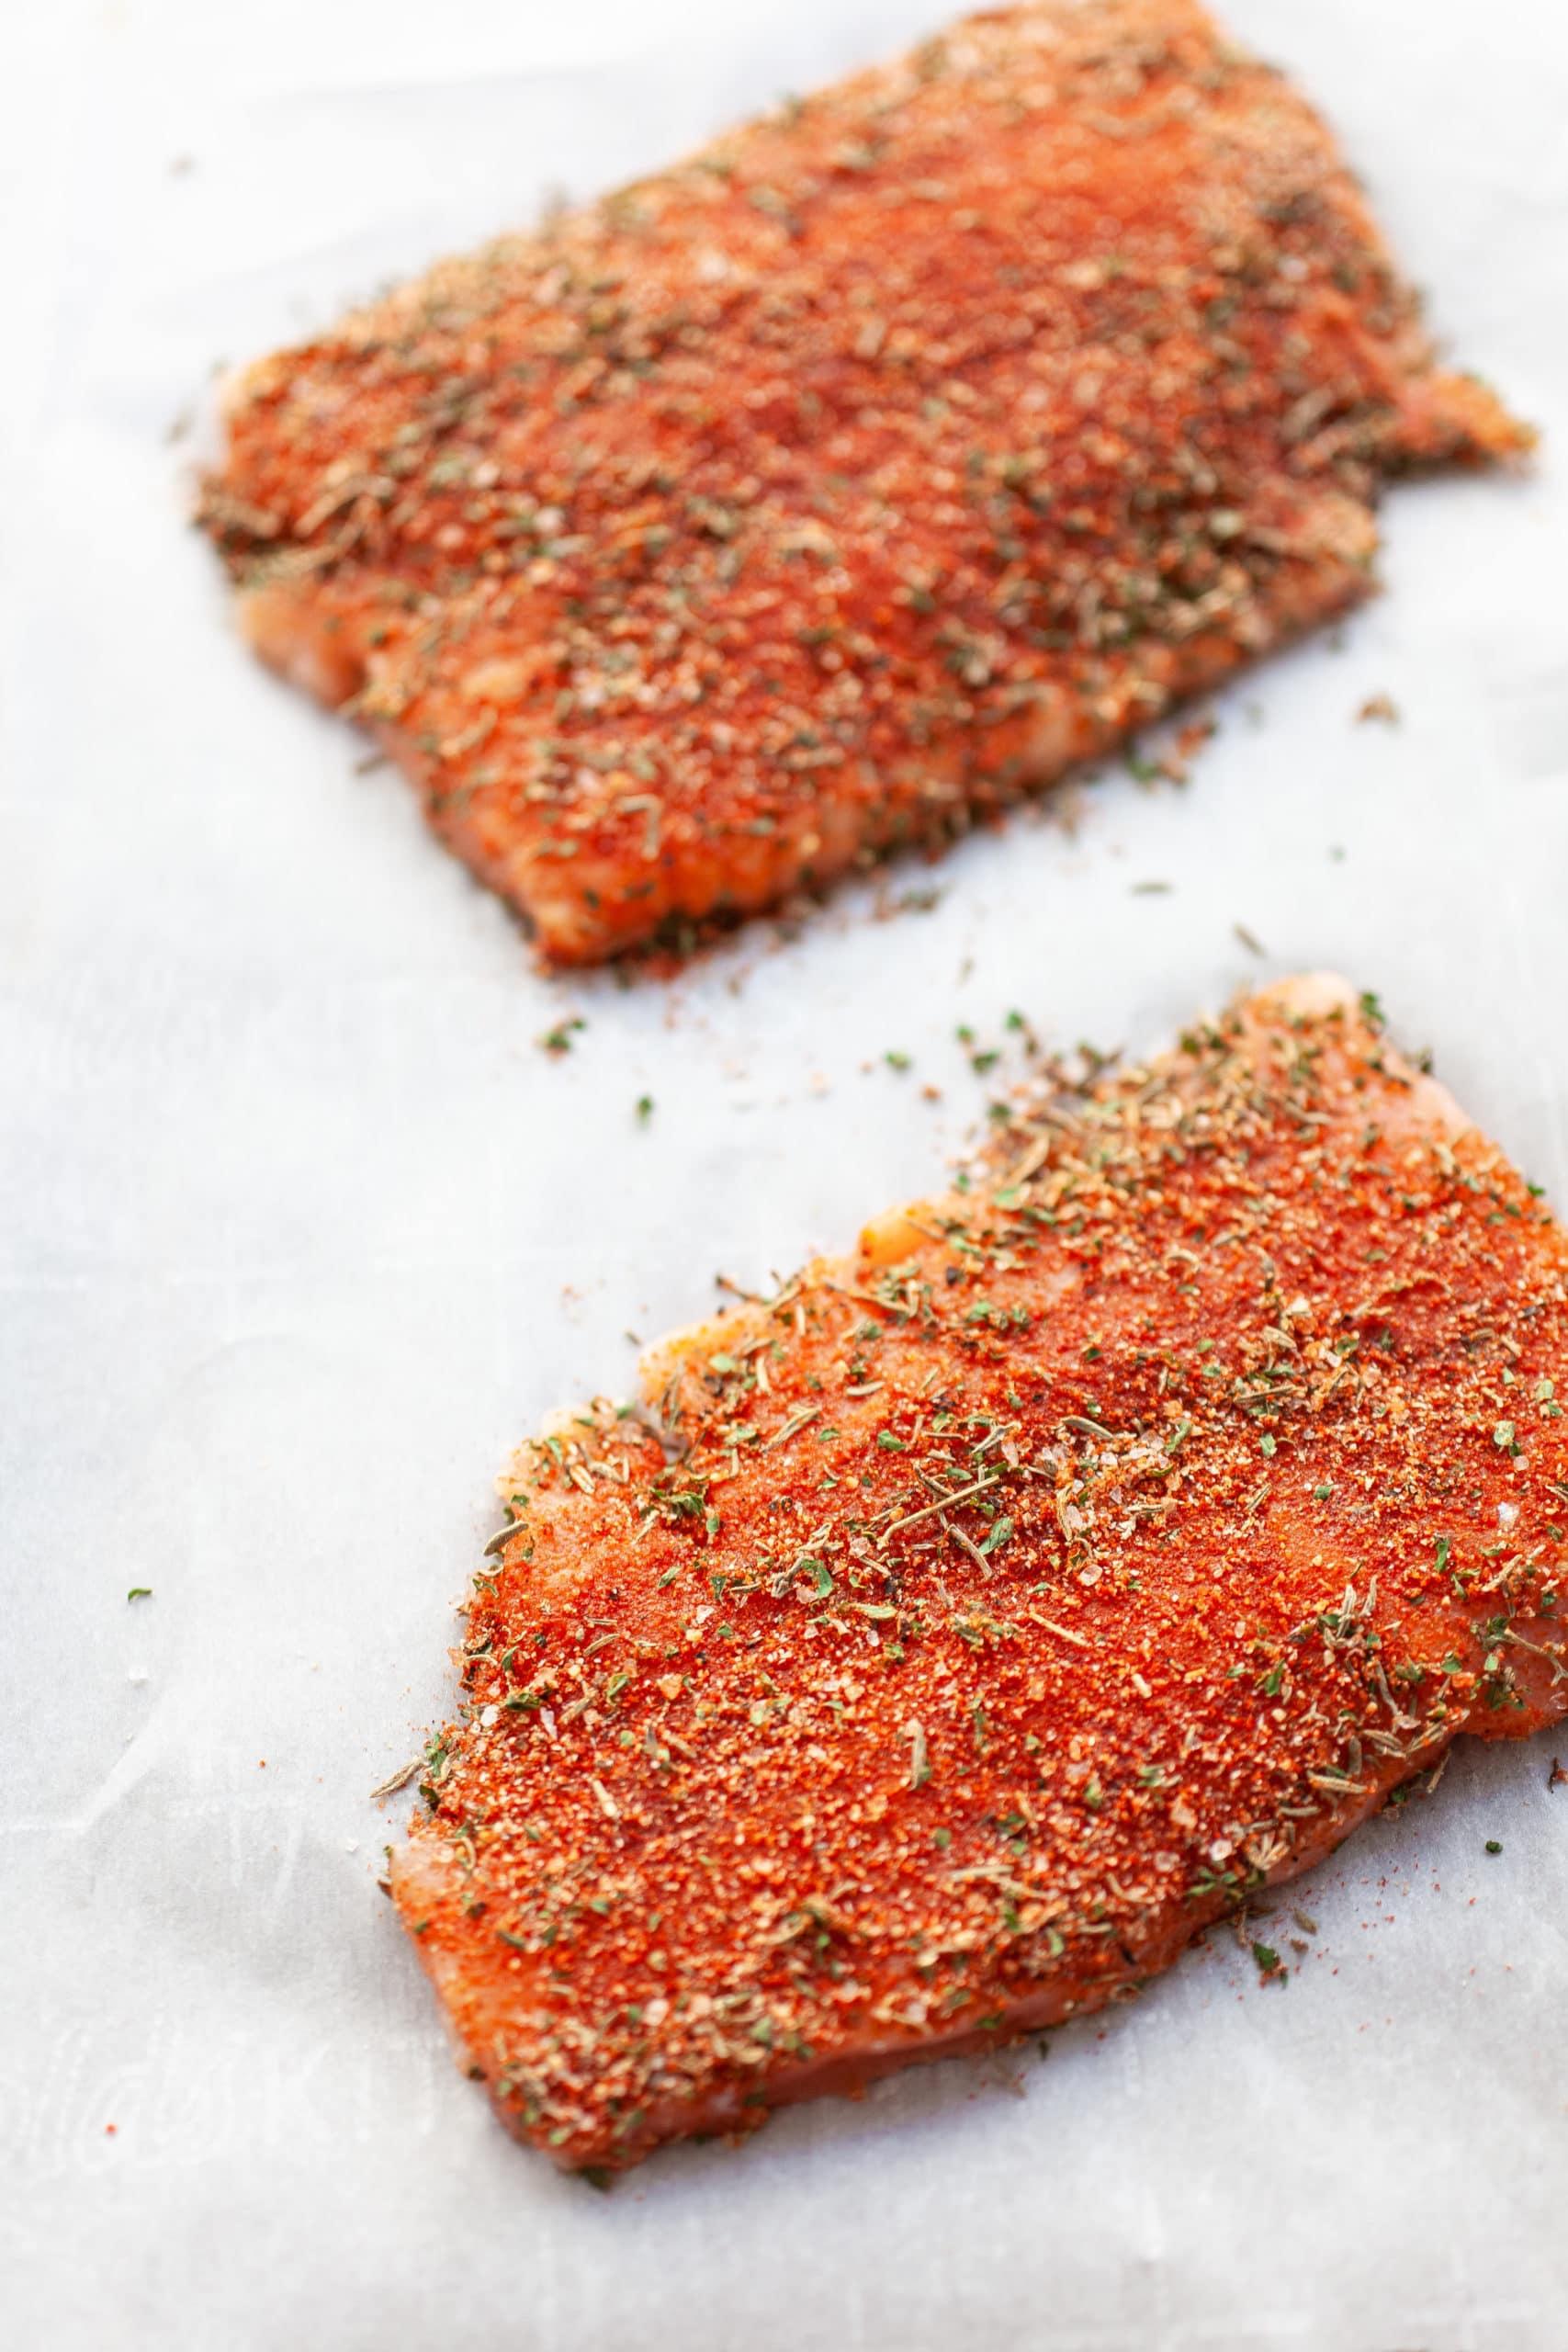 Making Healthy Blackened Salmon Salad